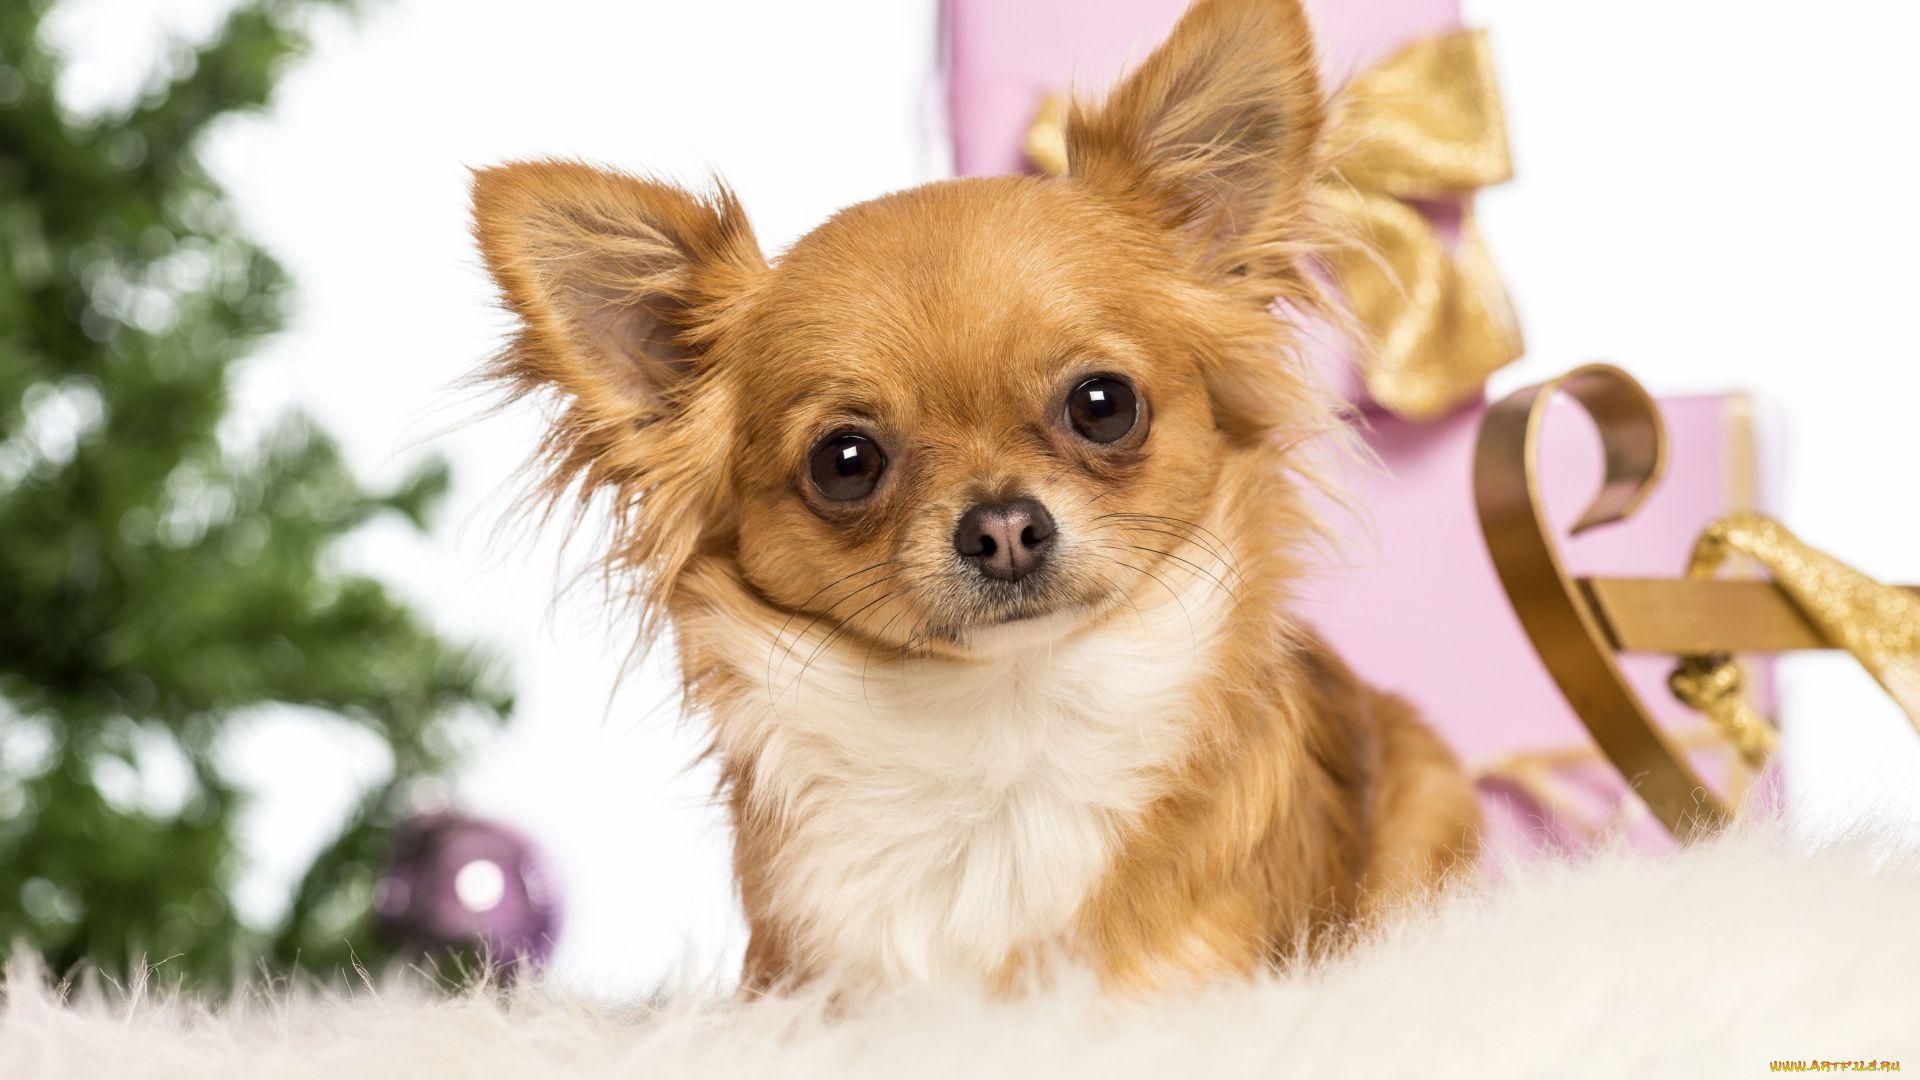 Chihuahua Dog Photo